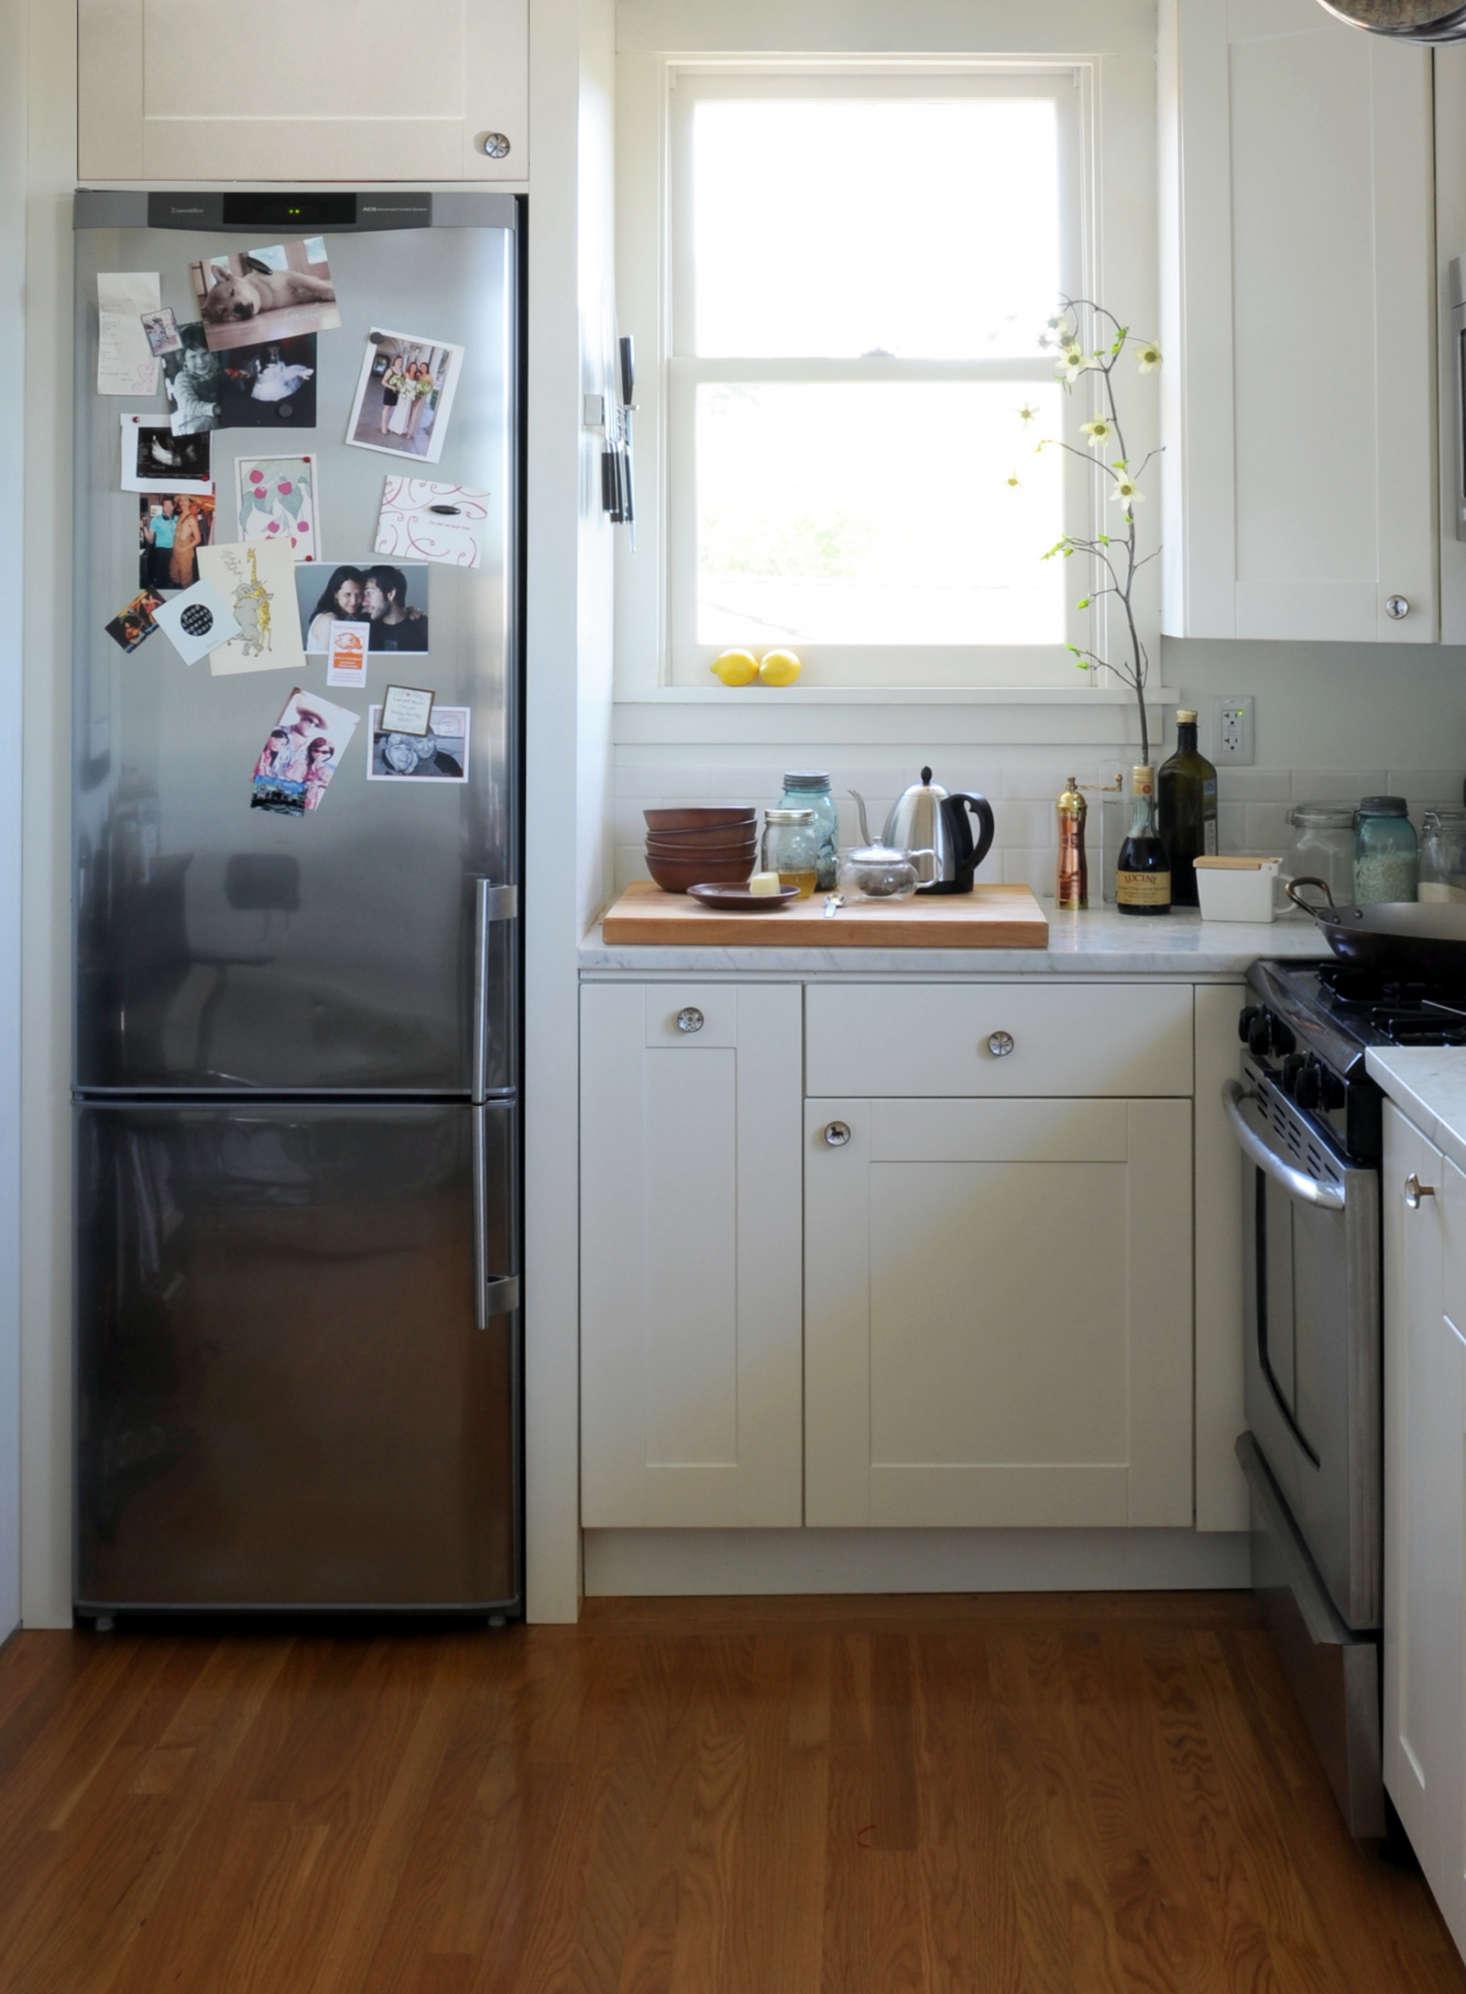 10 Easy Pieces: Best Skinny Refrigerators